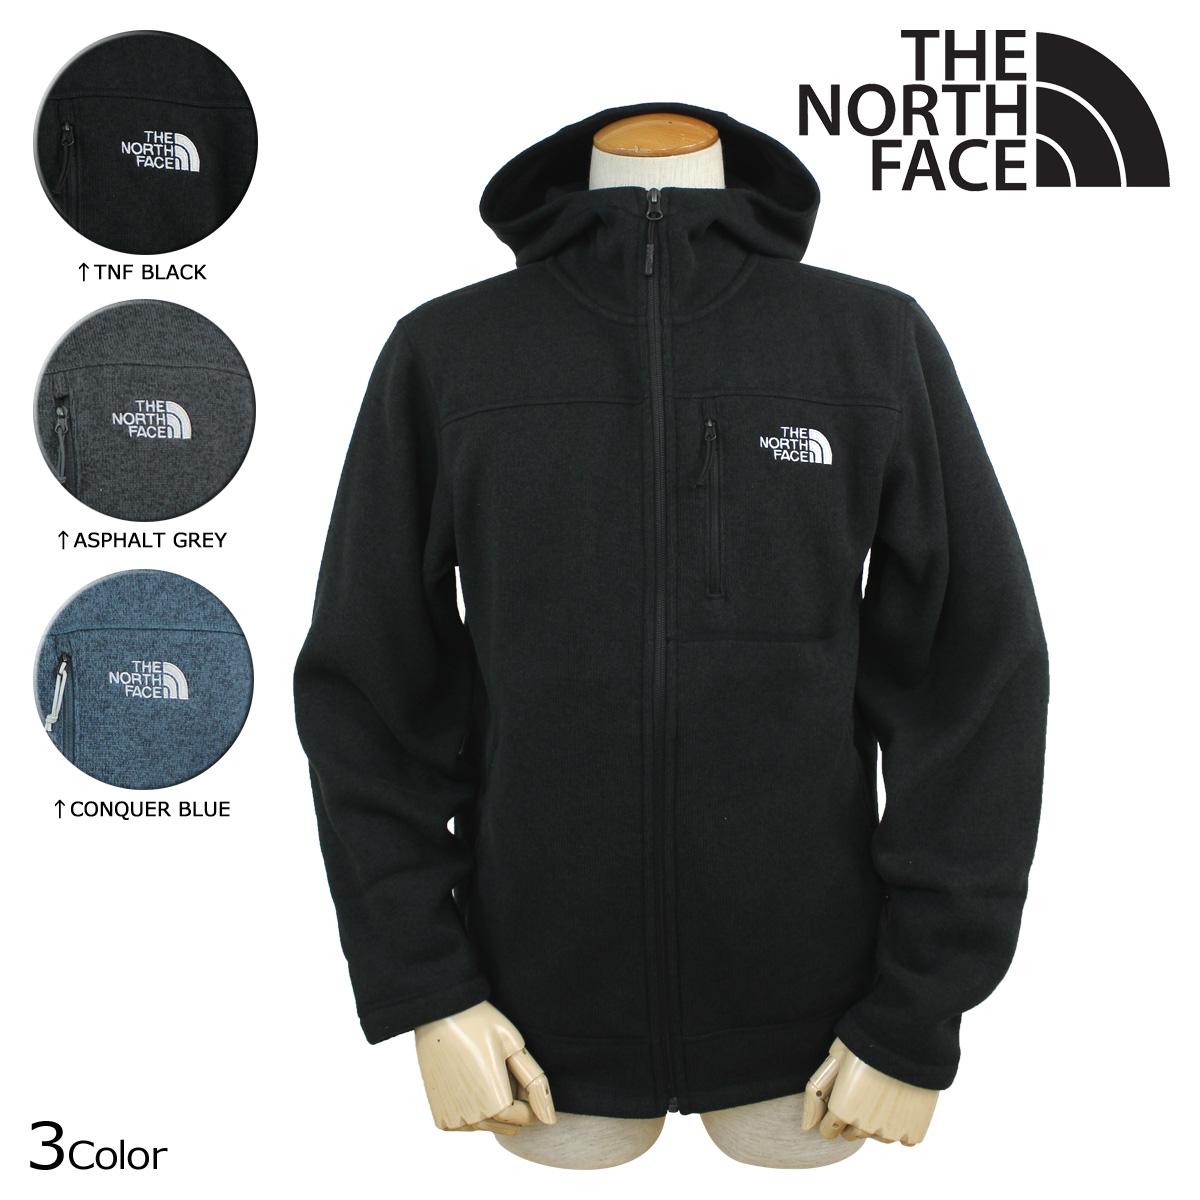 7a0b1c6c5 North Face THE NORTH FACE jacket fleece jacket MEN'S GORDON LYONS HOODIE men